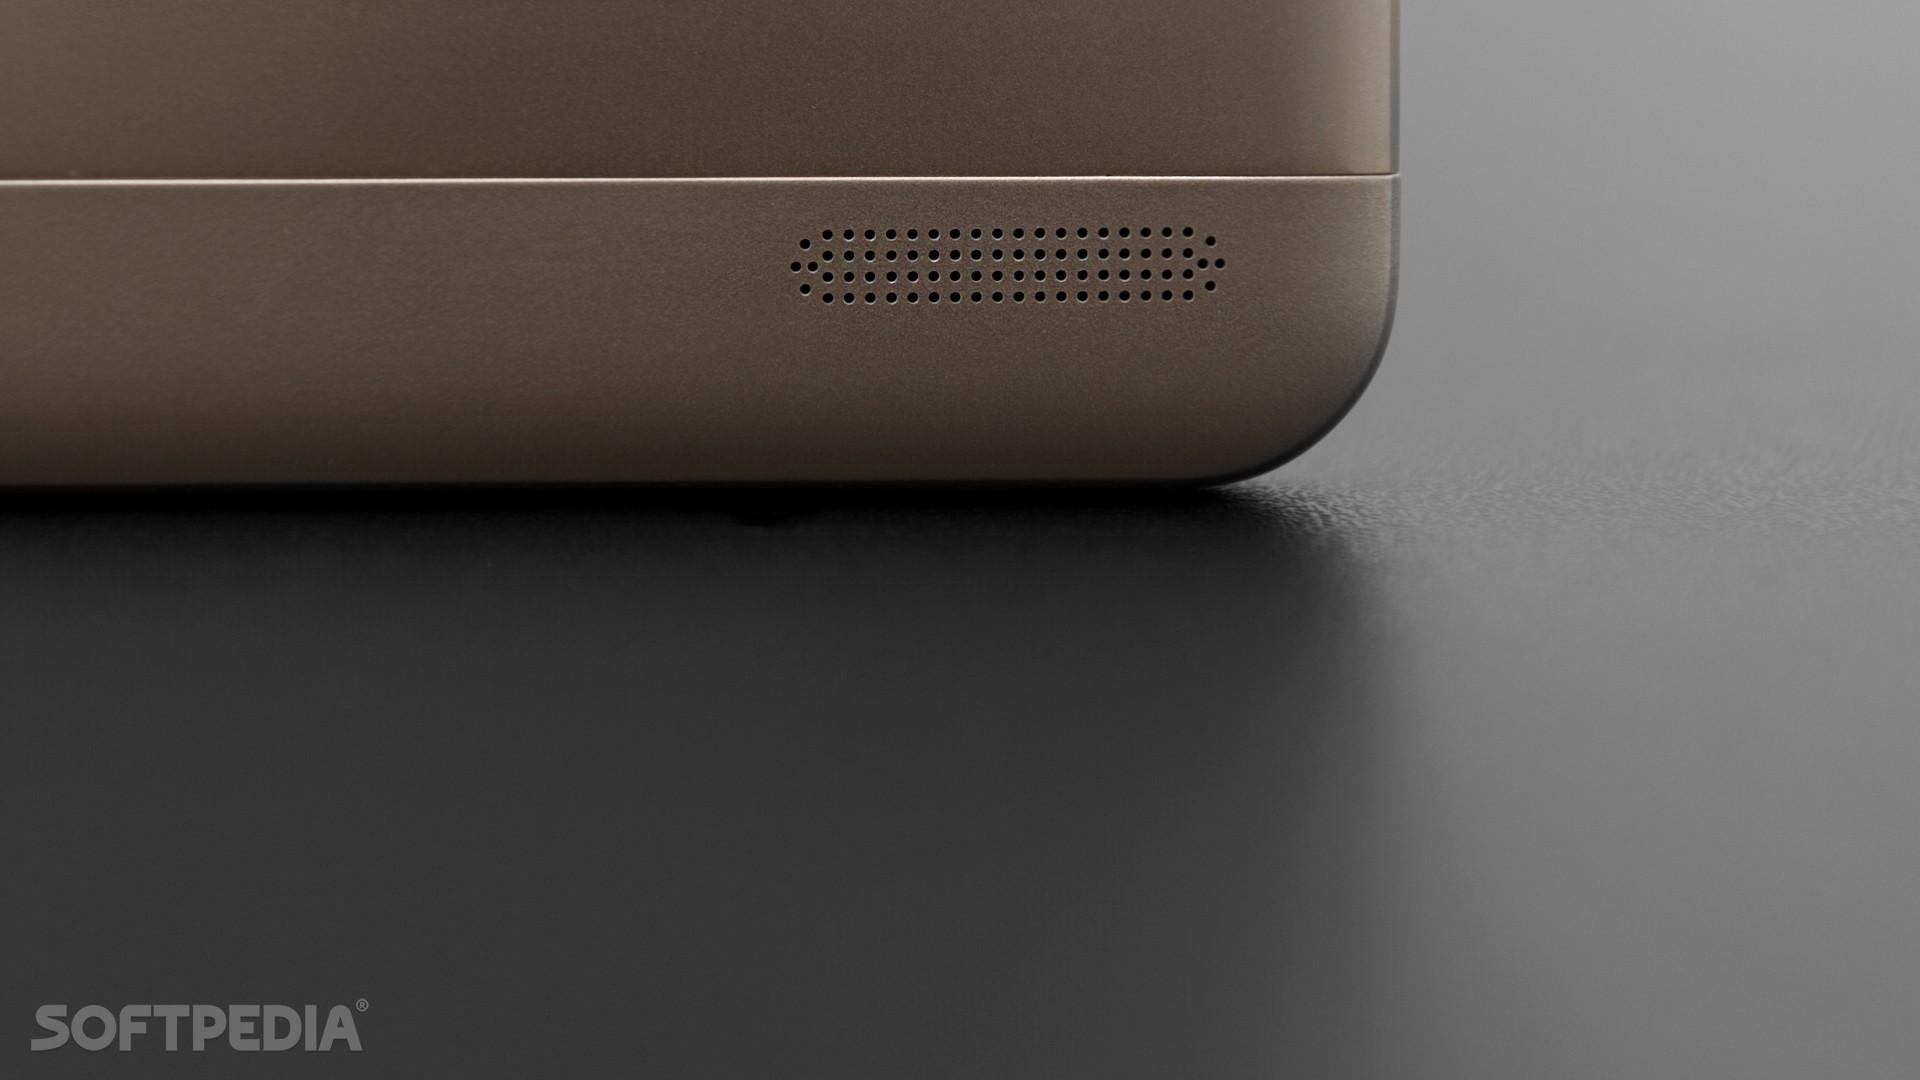 Huawei Honor (MediaPad) X2 Review